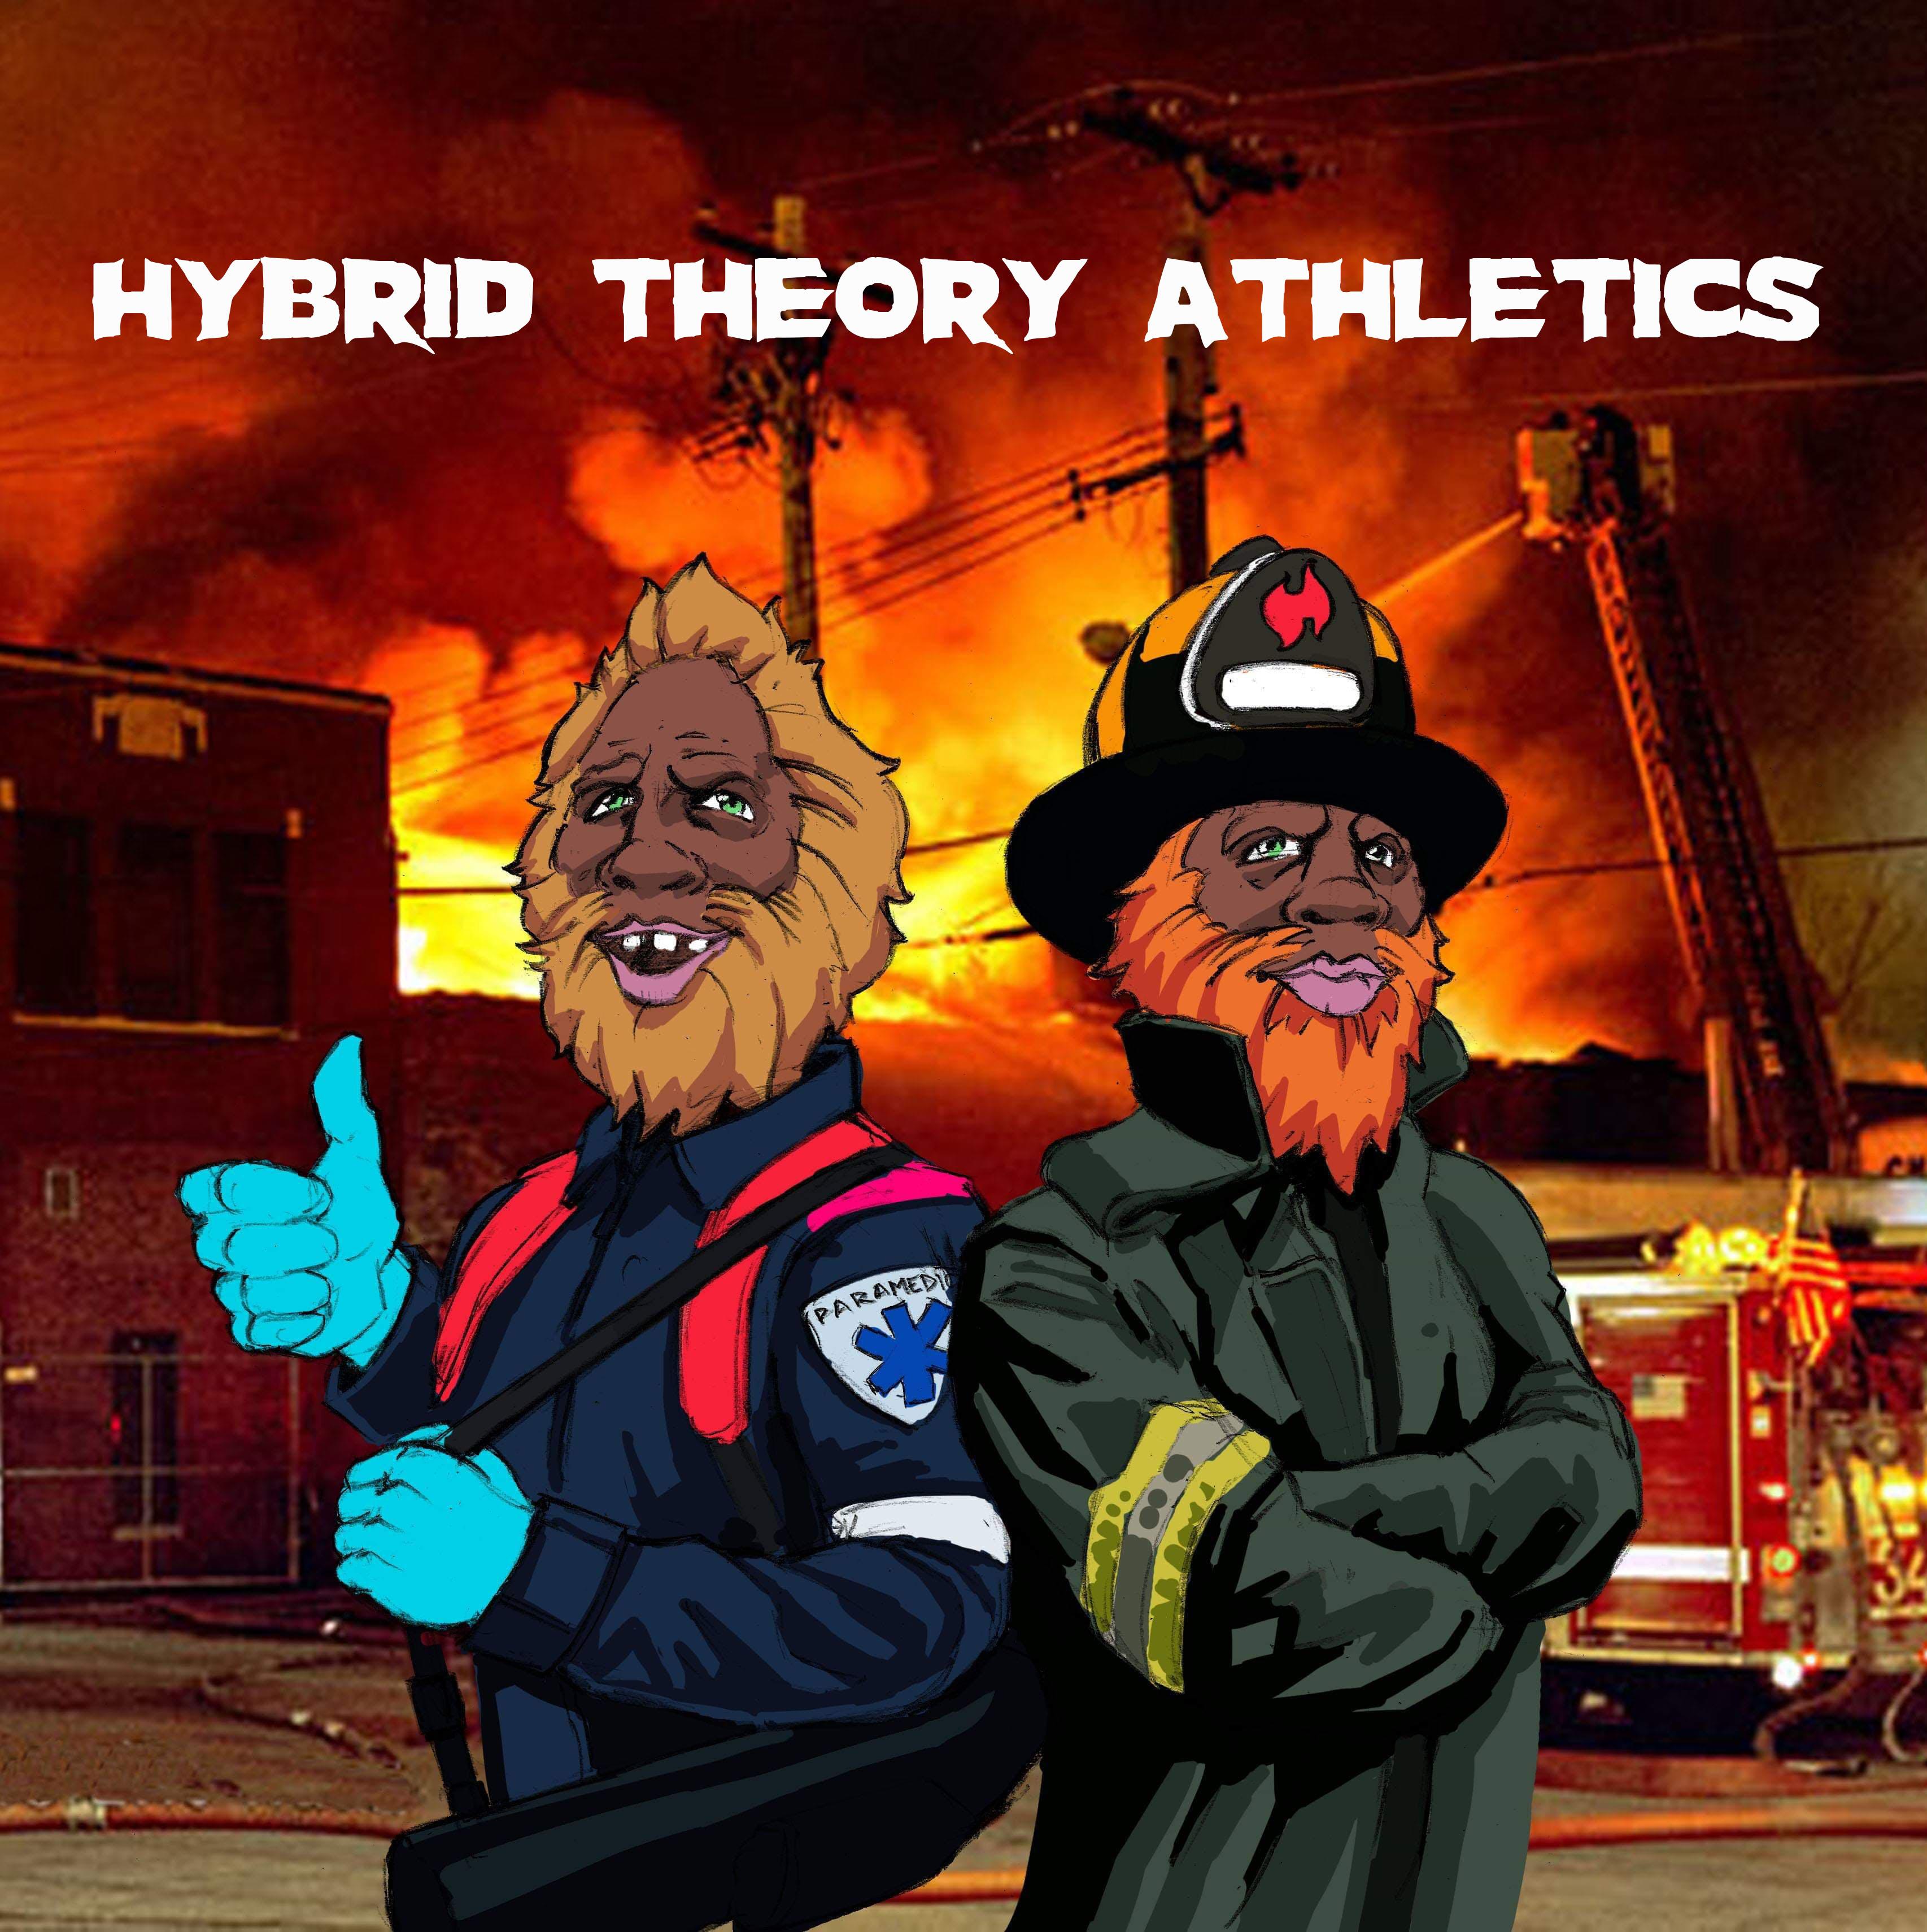 Hybrid Theory Athletics